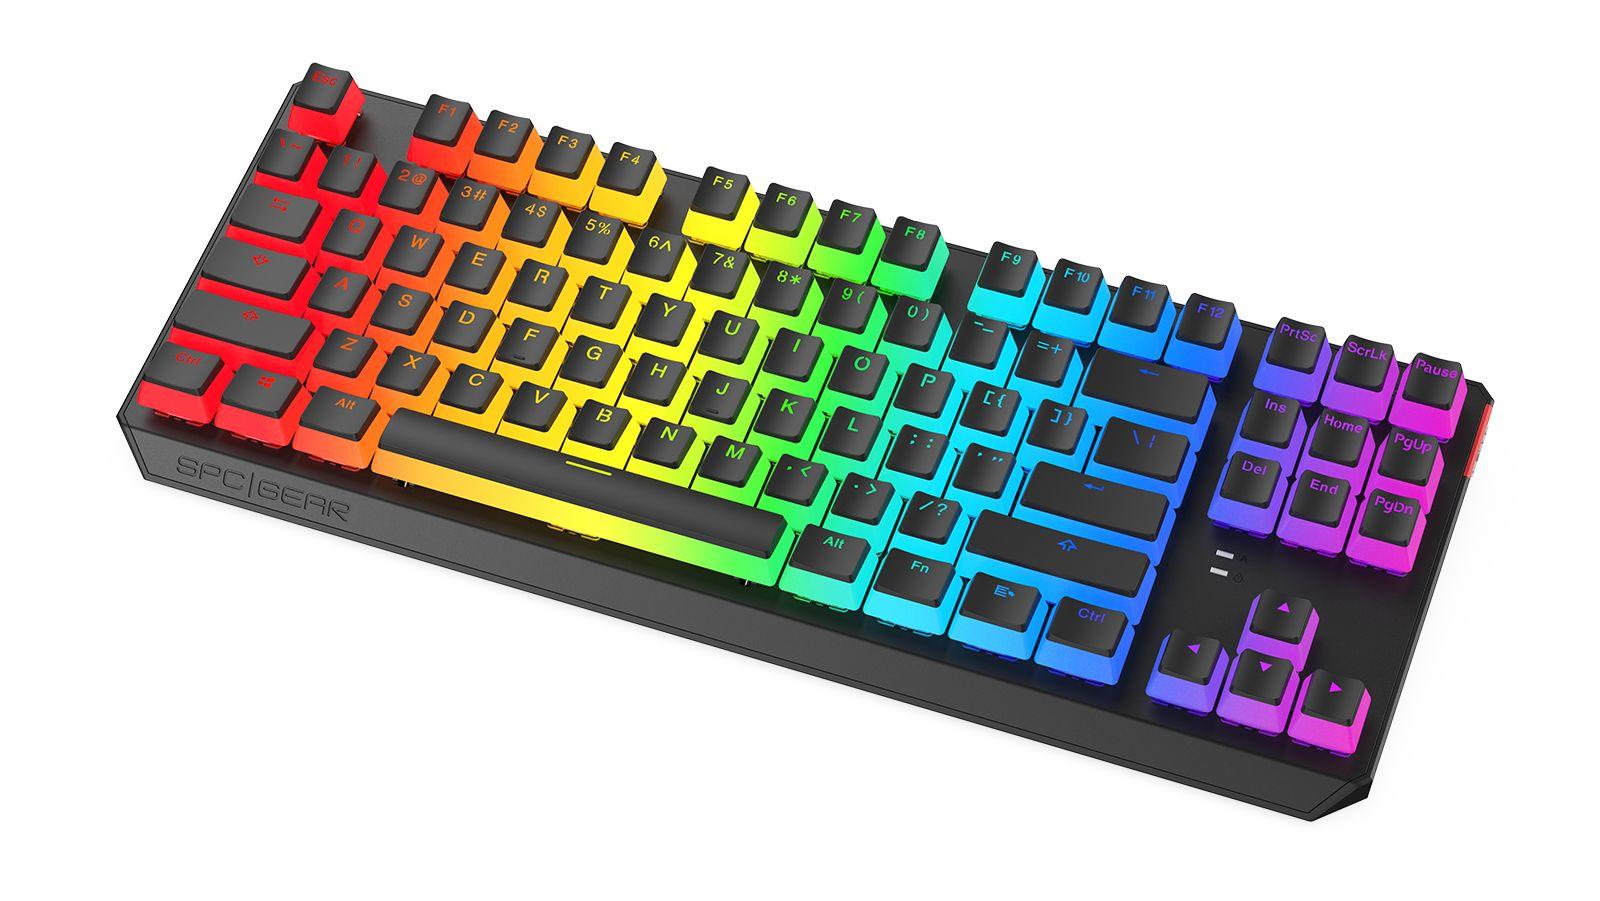 SPC Gear GK630 Pudding Tournament Kailh Brown RGB keyboard Black ENG (SPG075)